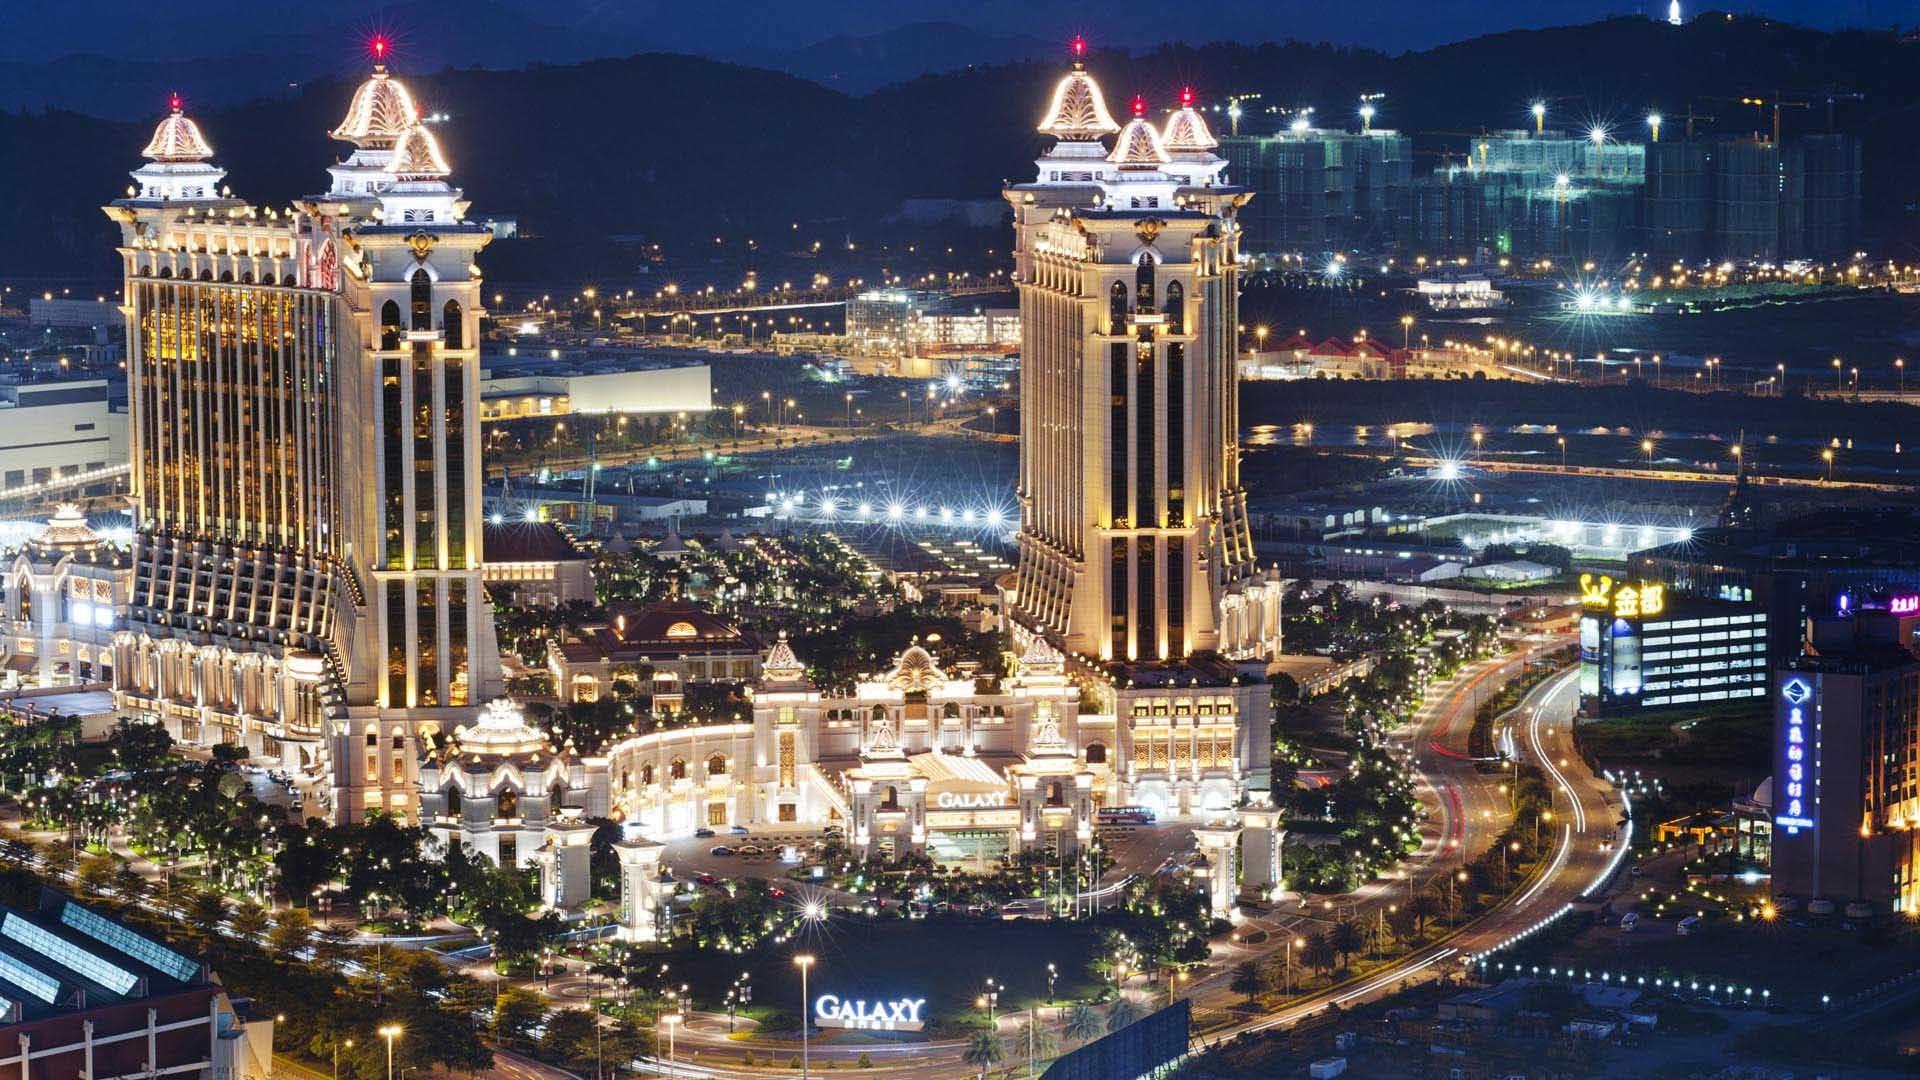 Galaxy Macau Casino / ギャラクシー・マカオ・カジノ